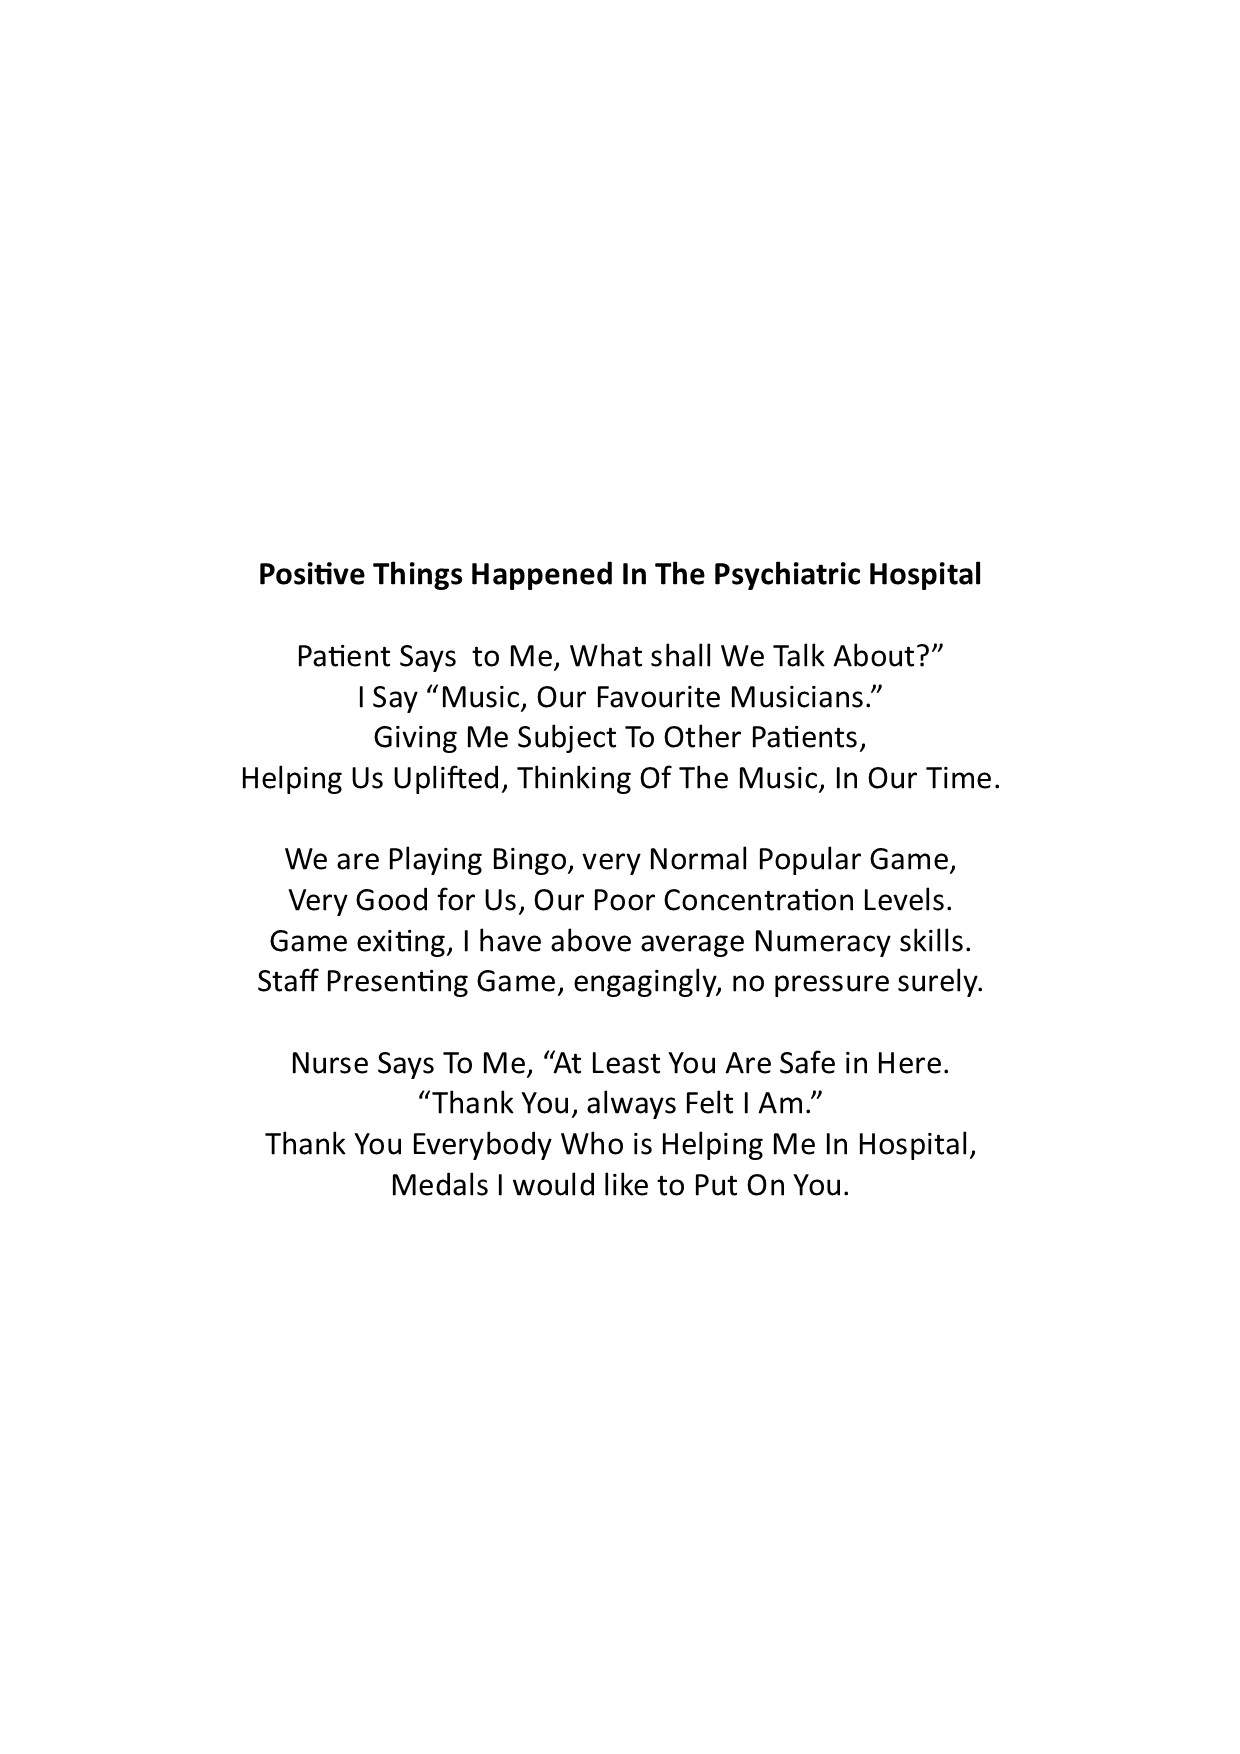 Positive things happened in the psychiateric hospital_Website.jpg